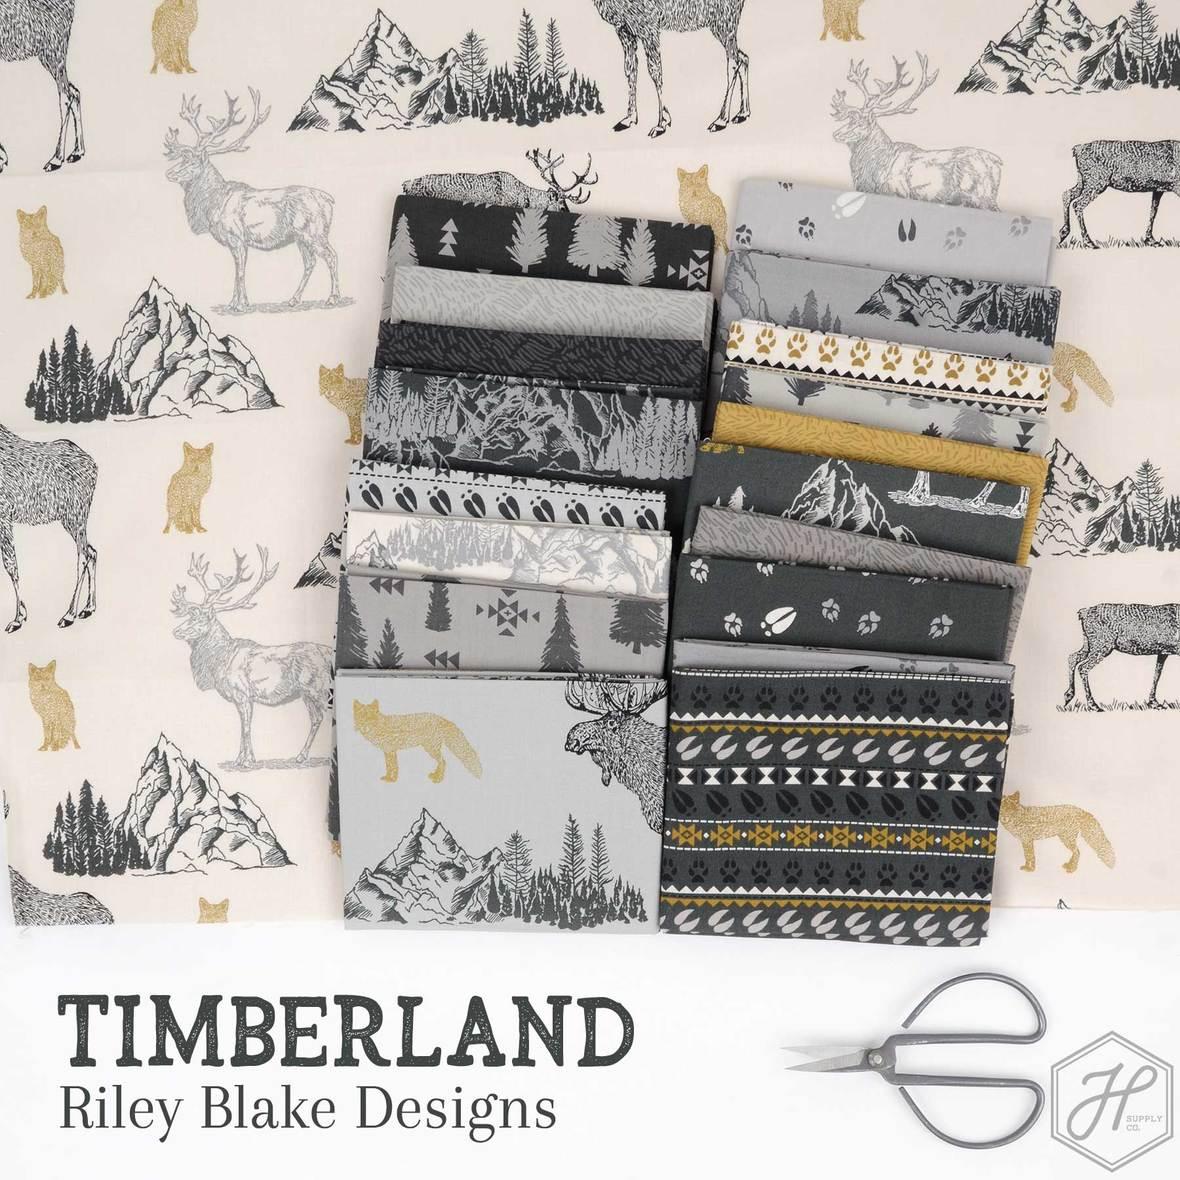 Timberland-Riley-Blake-Designs-at-Hawthrone-Supply-Co